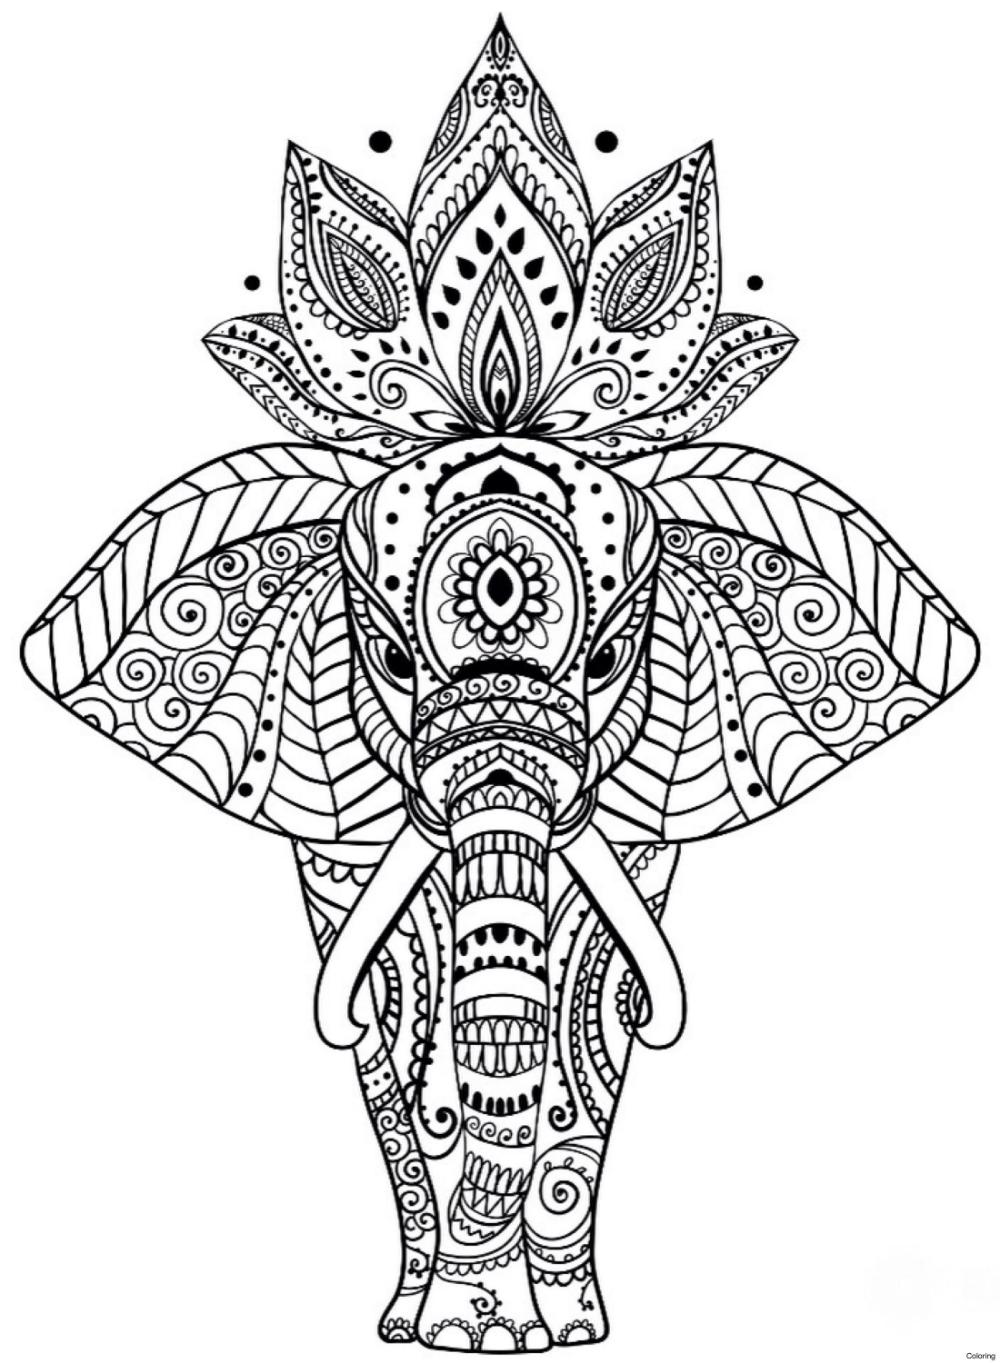 Coloring Page: Mandala Coloring Pages Free Printable ...